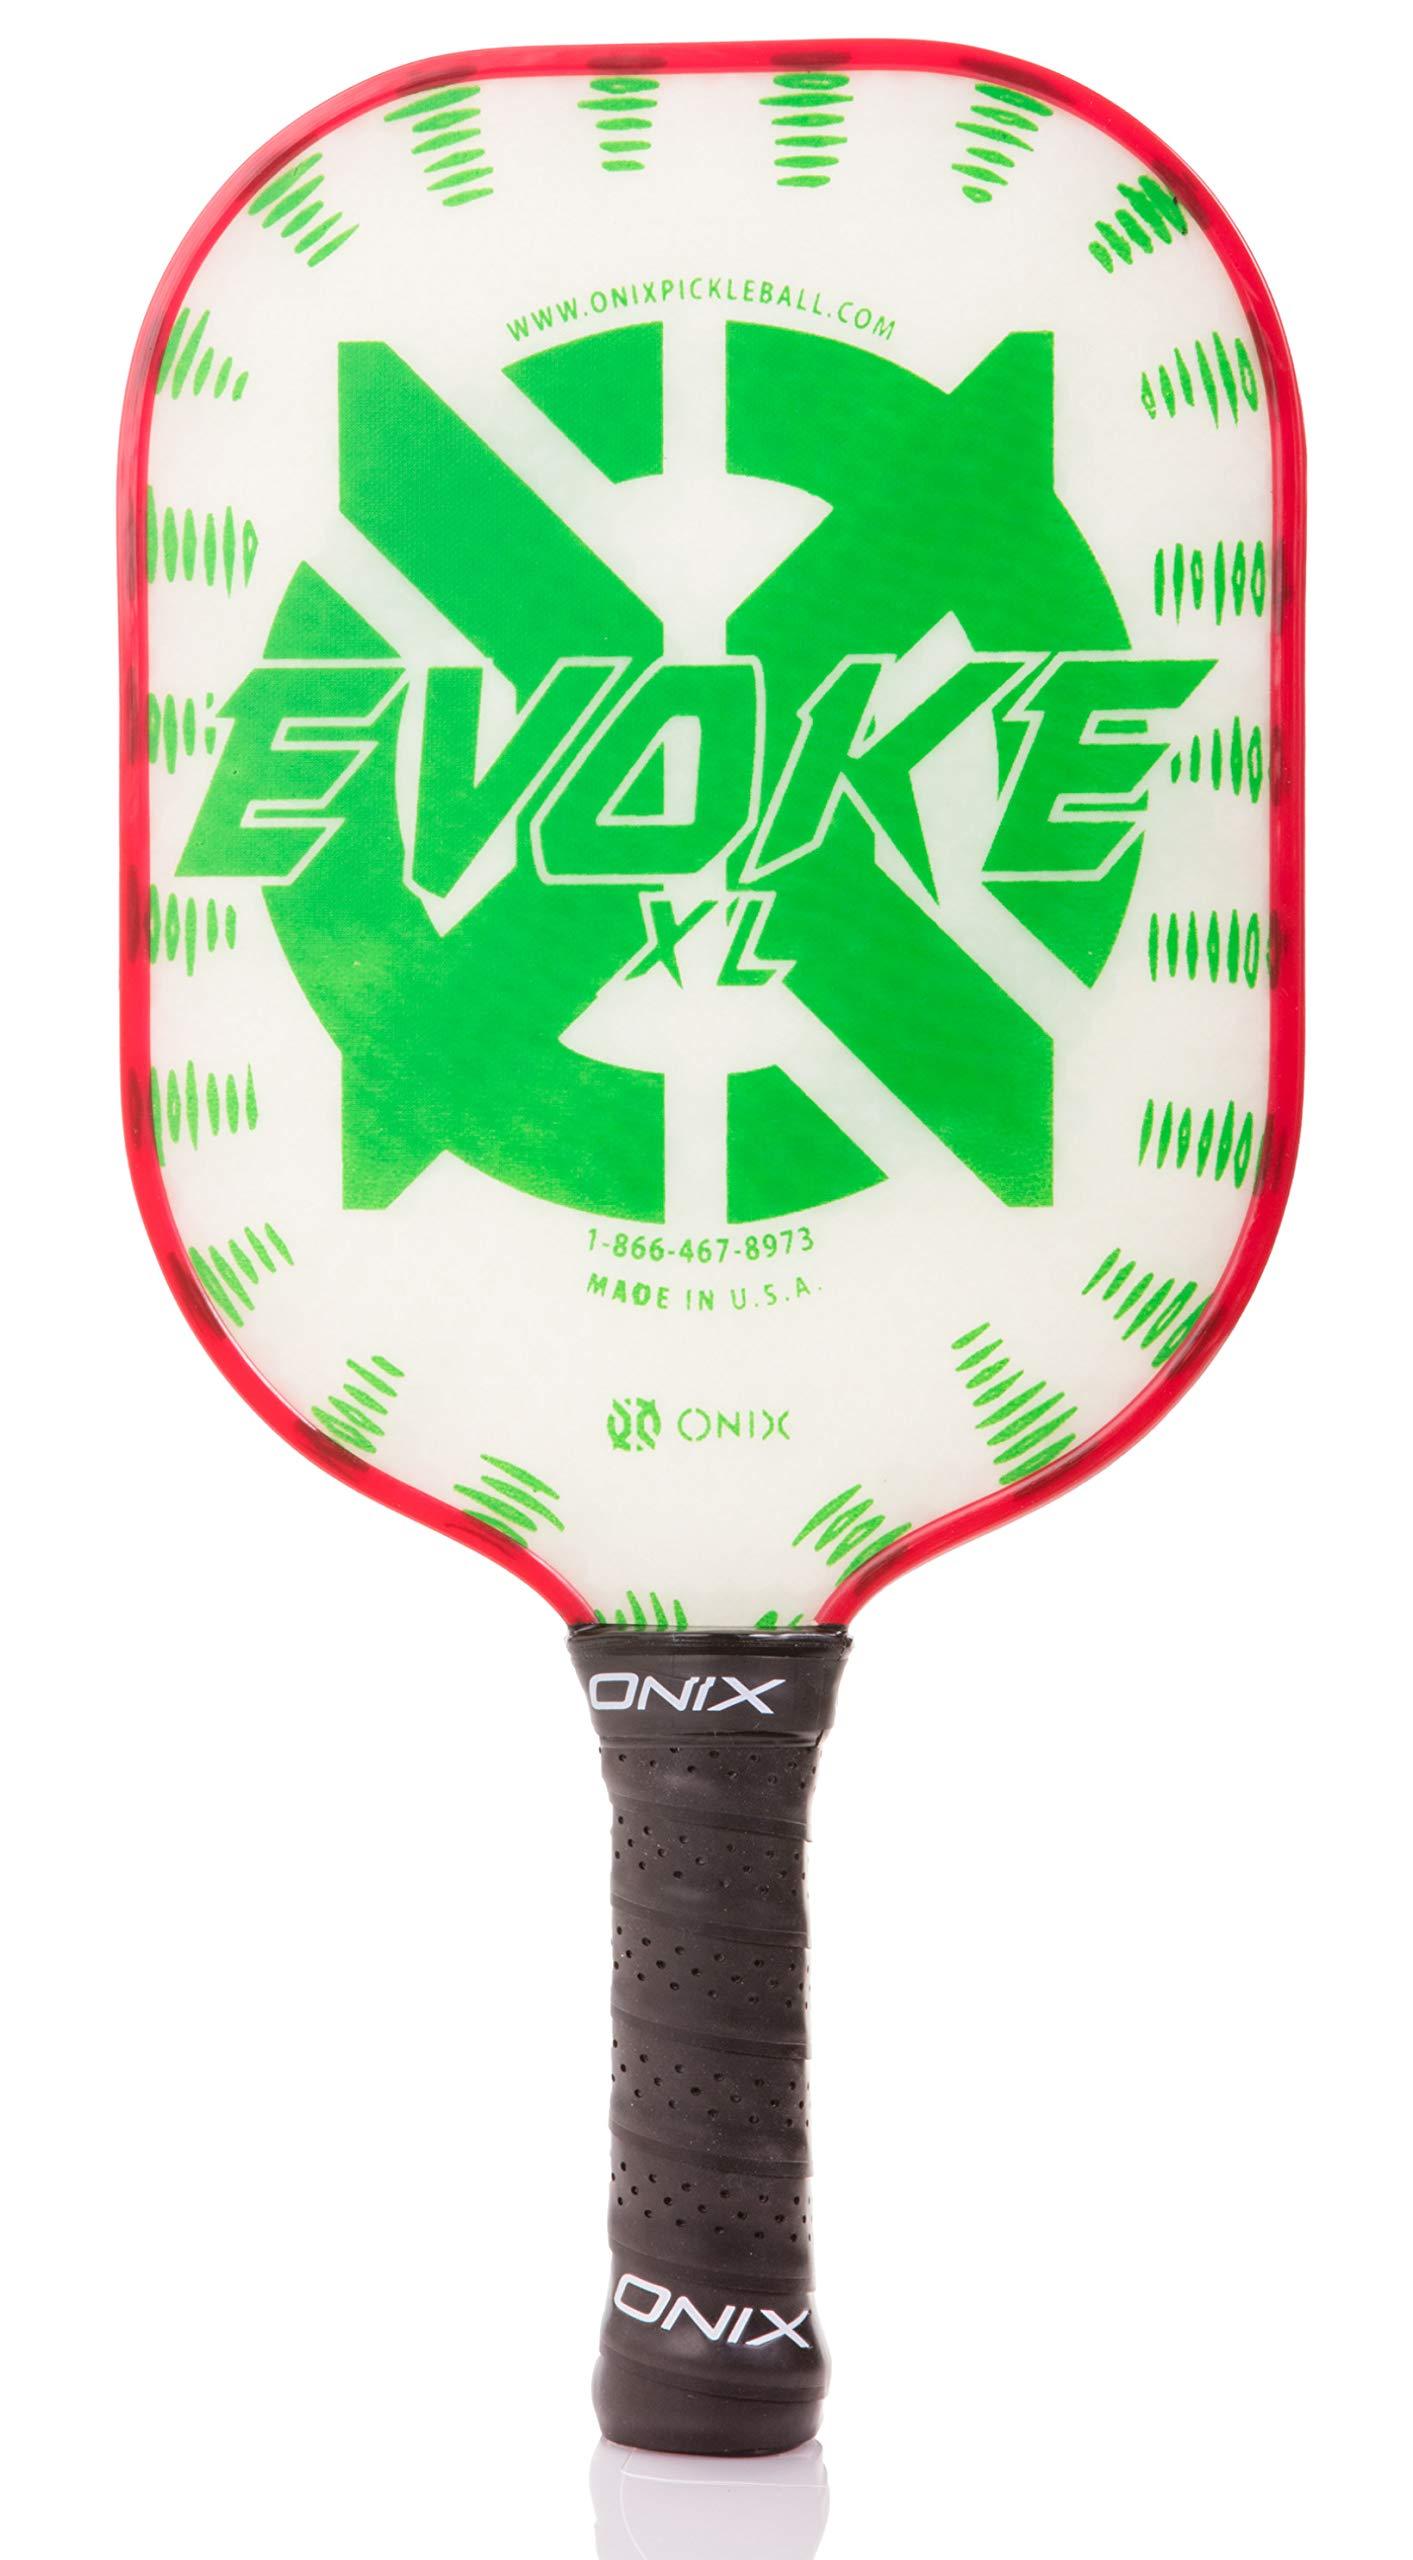 Onix Evoke Series Pickleball Paddles with Composite Fa -P0NM